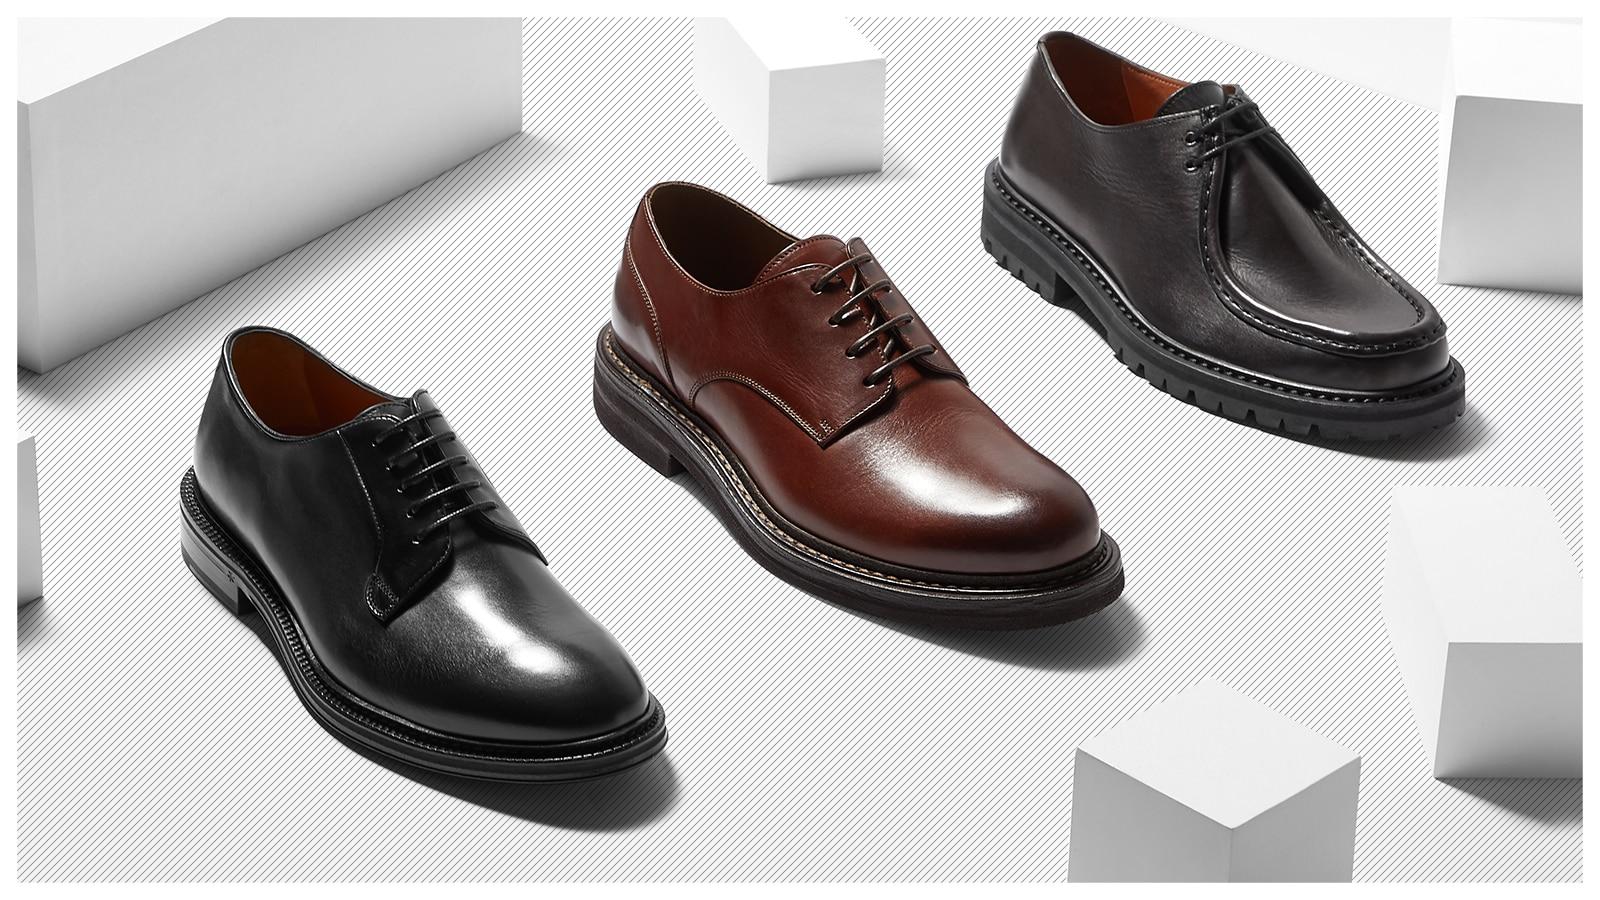 Three Ways To Wear Derby Shoes In 2018